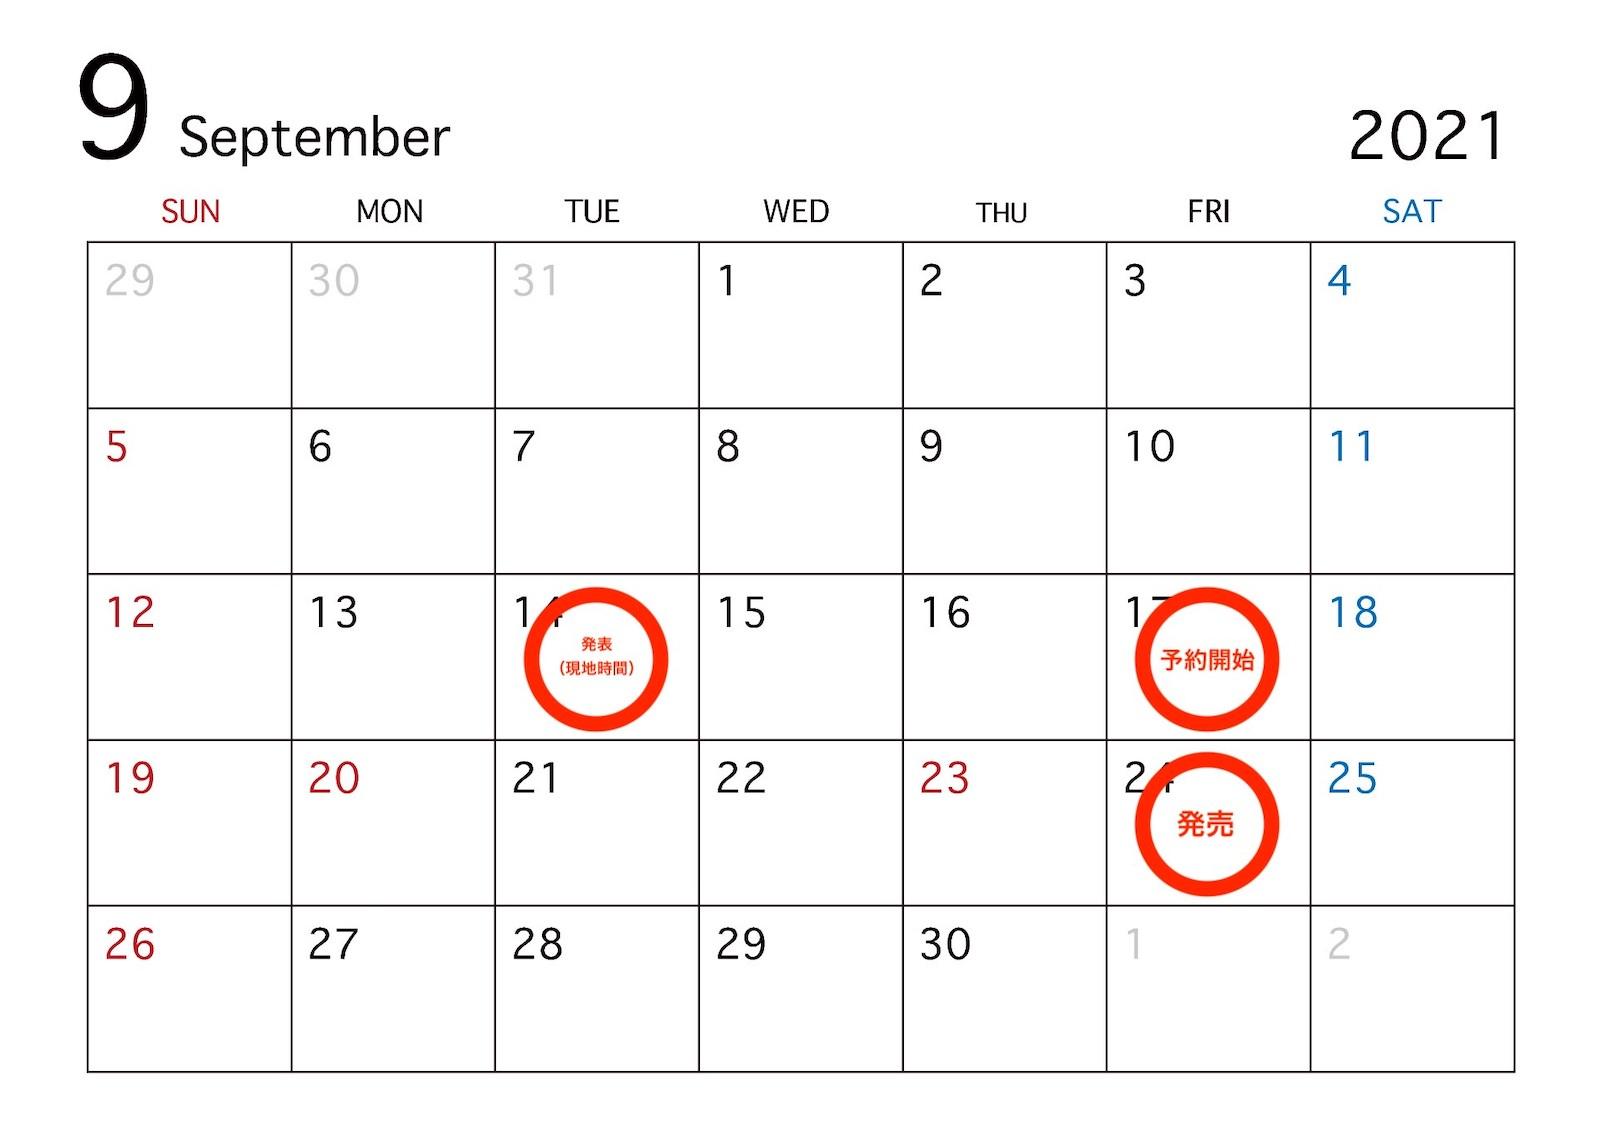 IPhone Launch Schedule